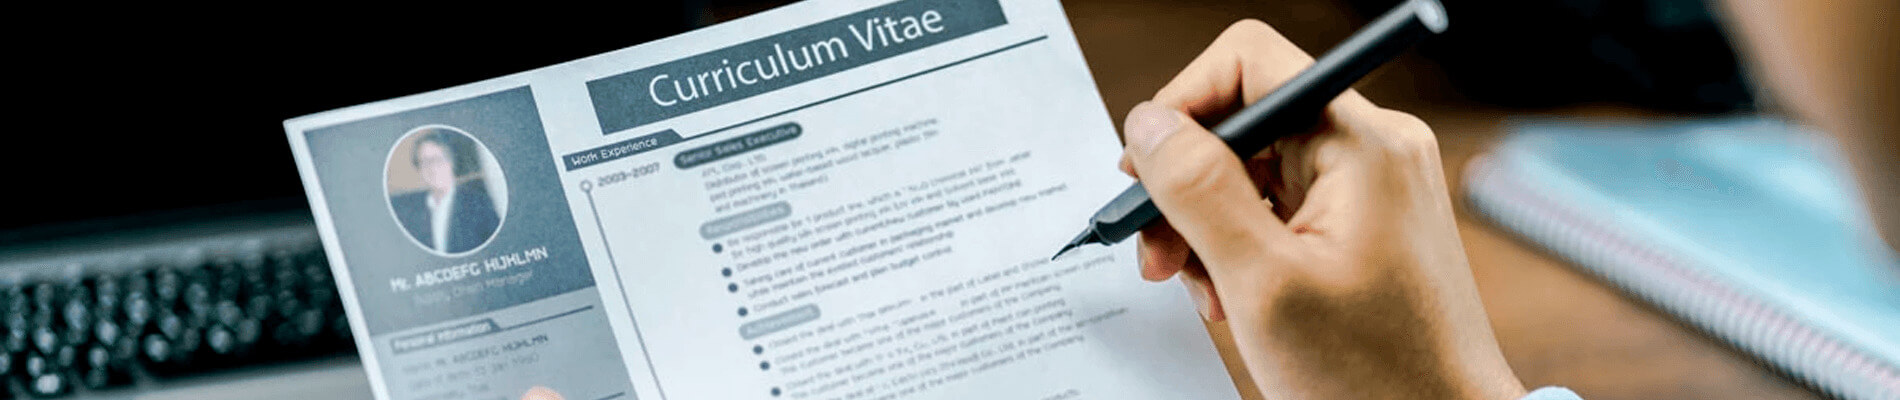 Tips para mejorar tu currículum